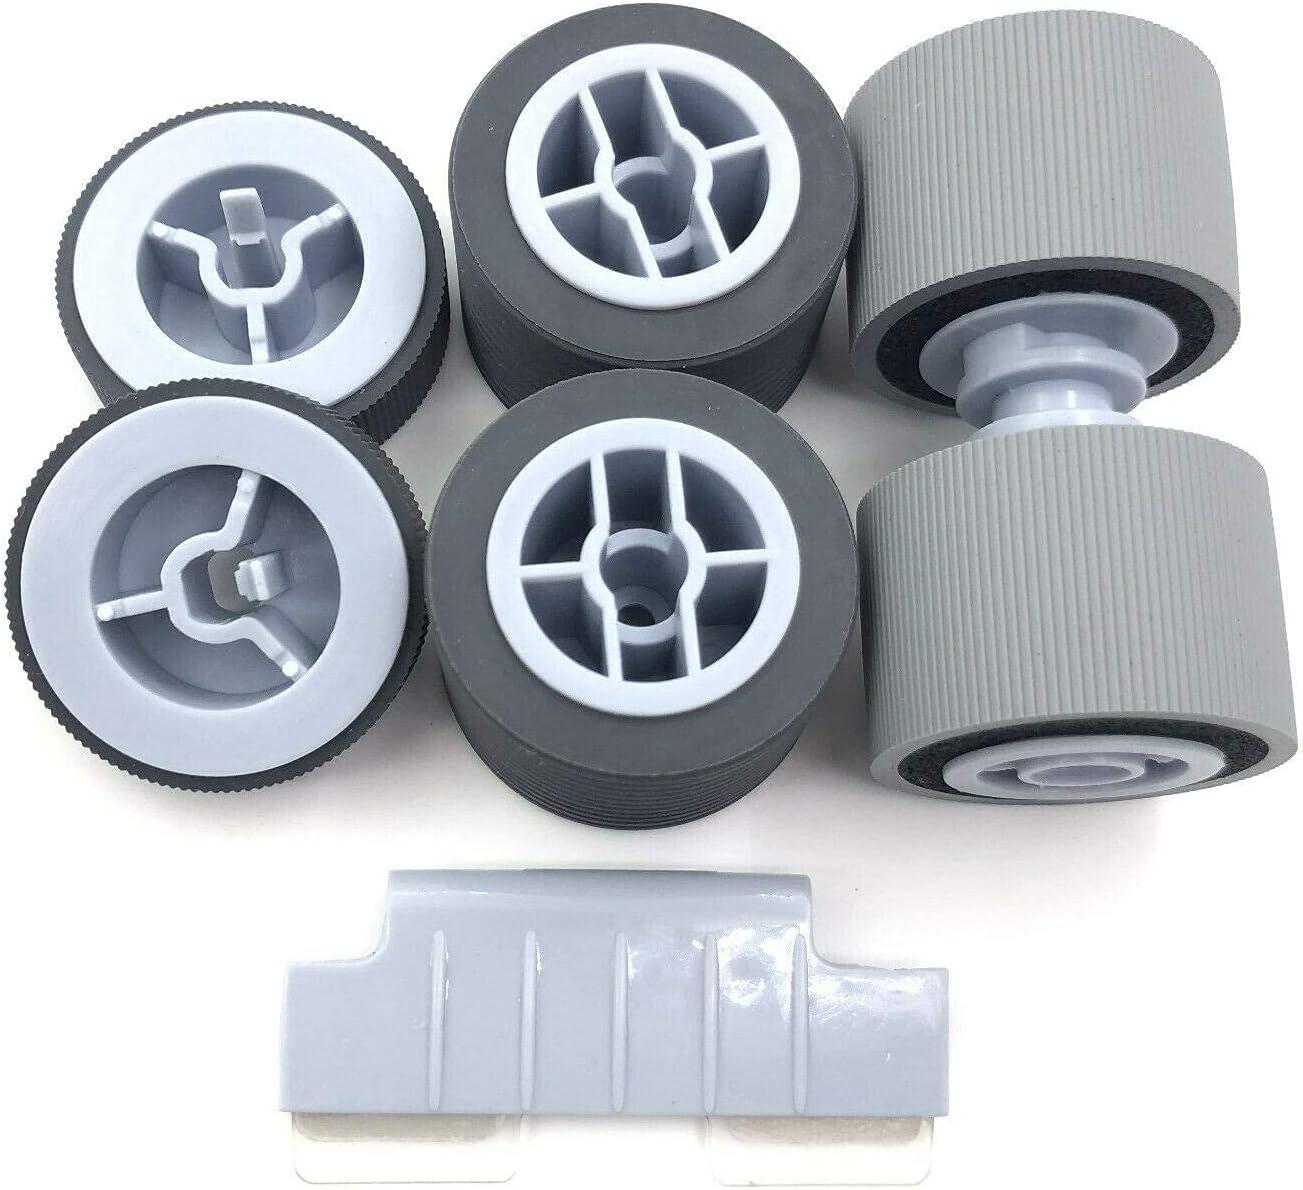 JRUIAN 1set PA03450-K011 K012 Washington Mall K013 Max 60% OFF K014 Brake Ro + Pickup Roller